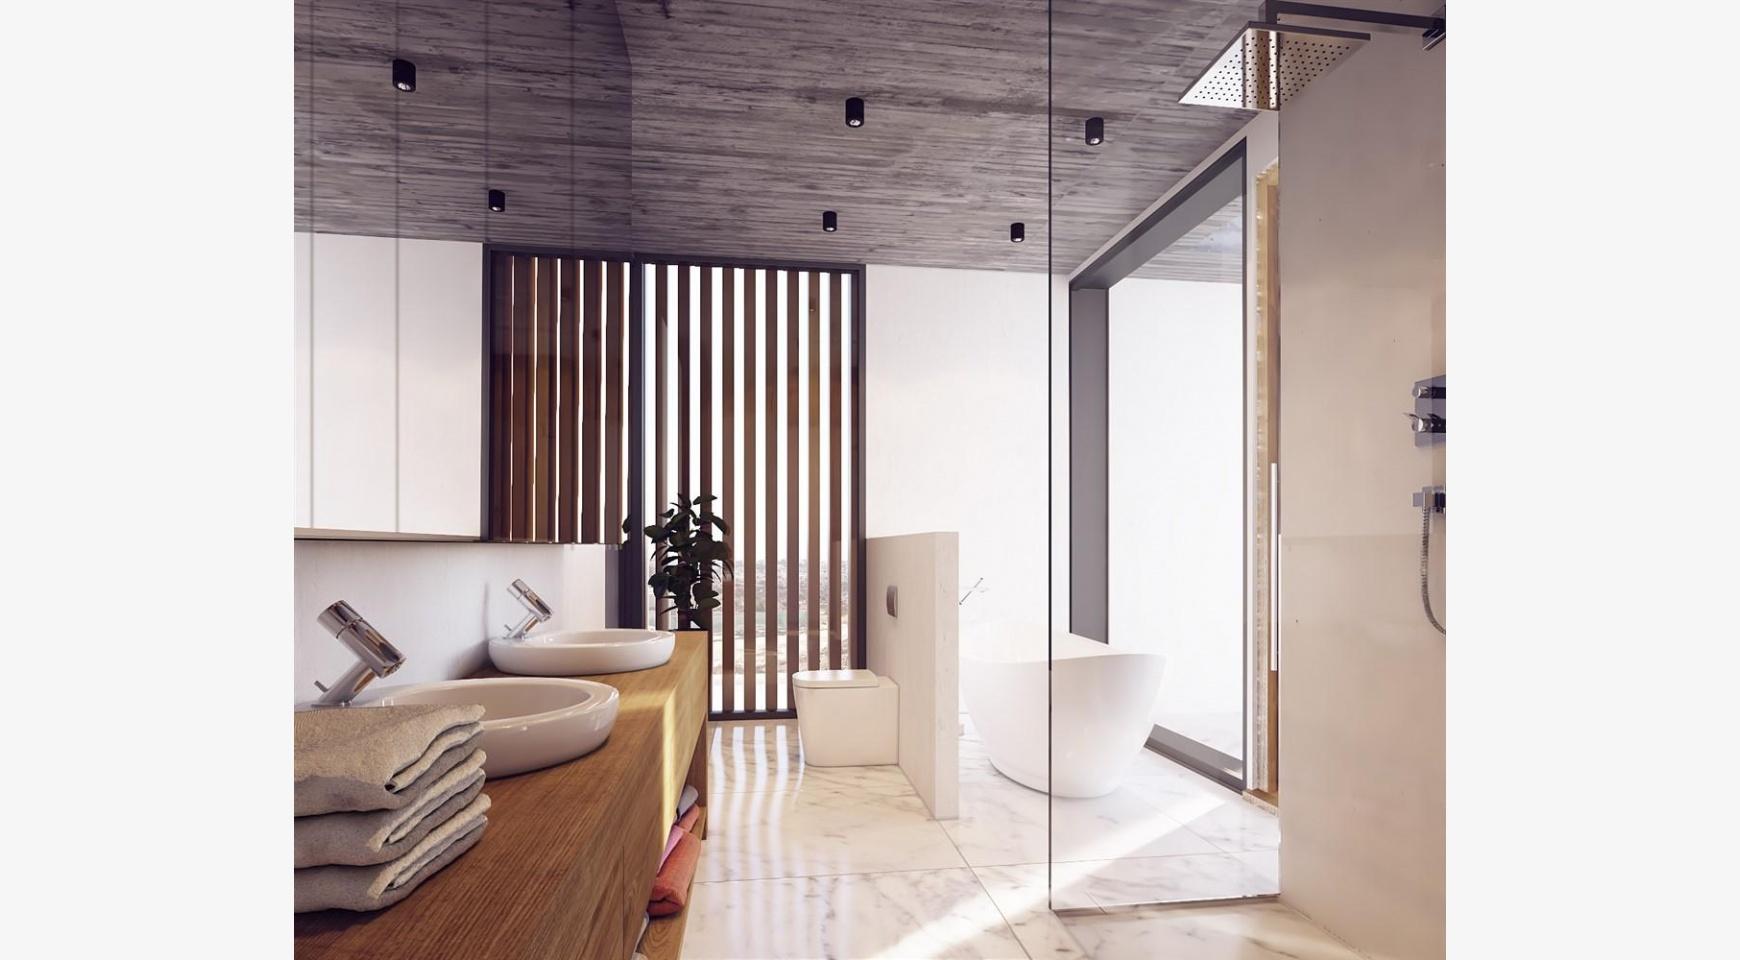 Exclusive 4 Bedroom Villa with Stunning Views in Germasogeia - 8